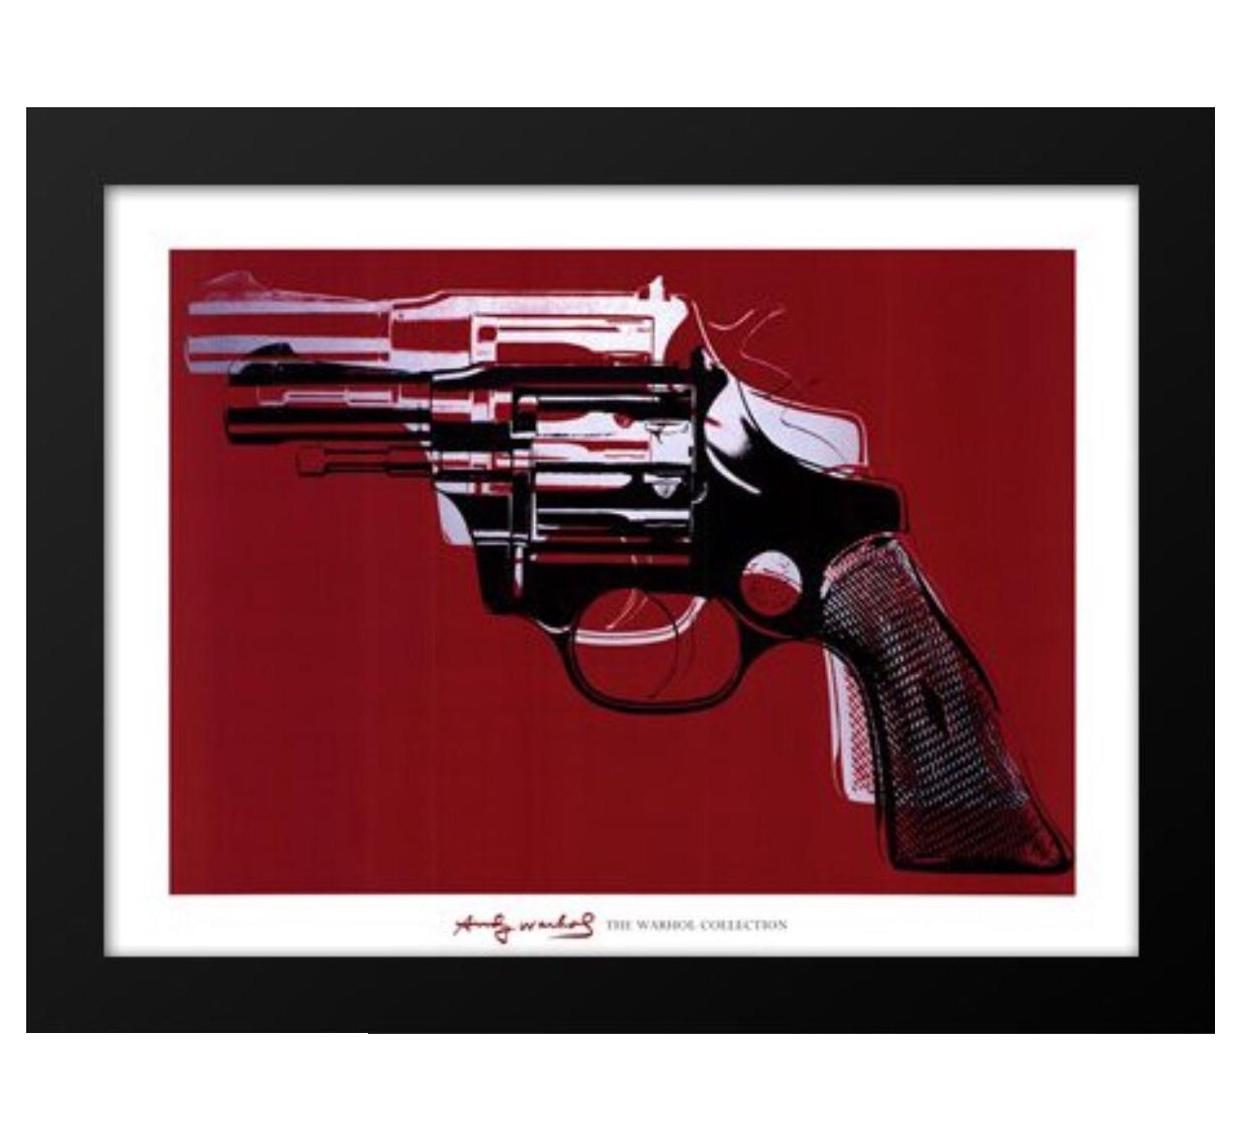 1981 Gun Andy Warhol Framed Print Chairish